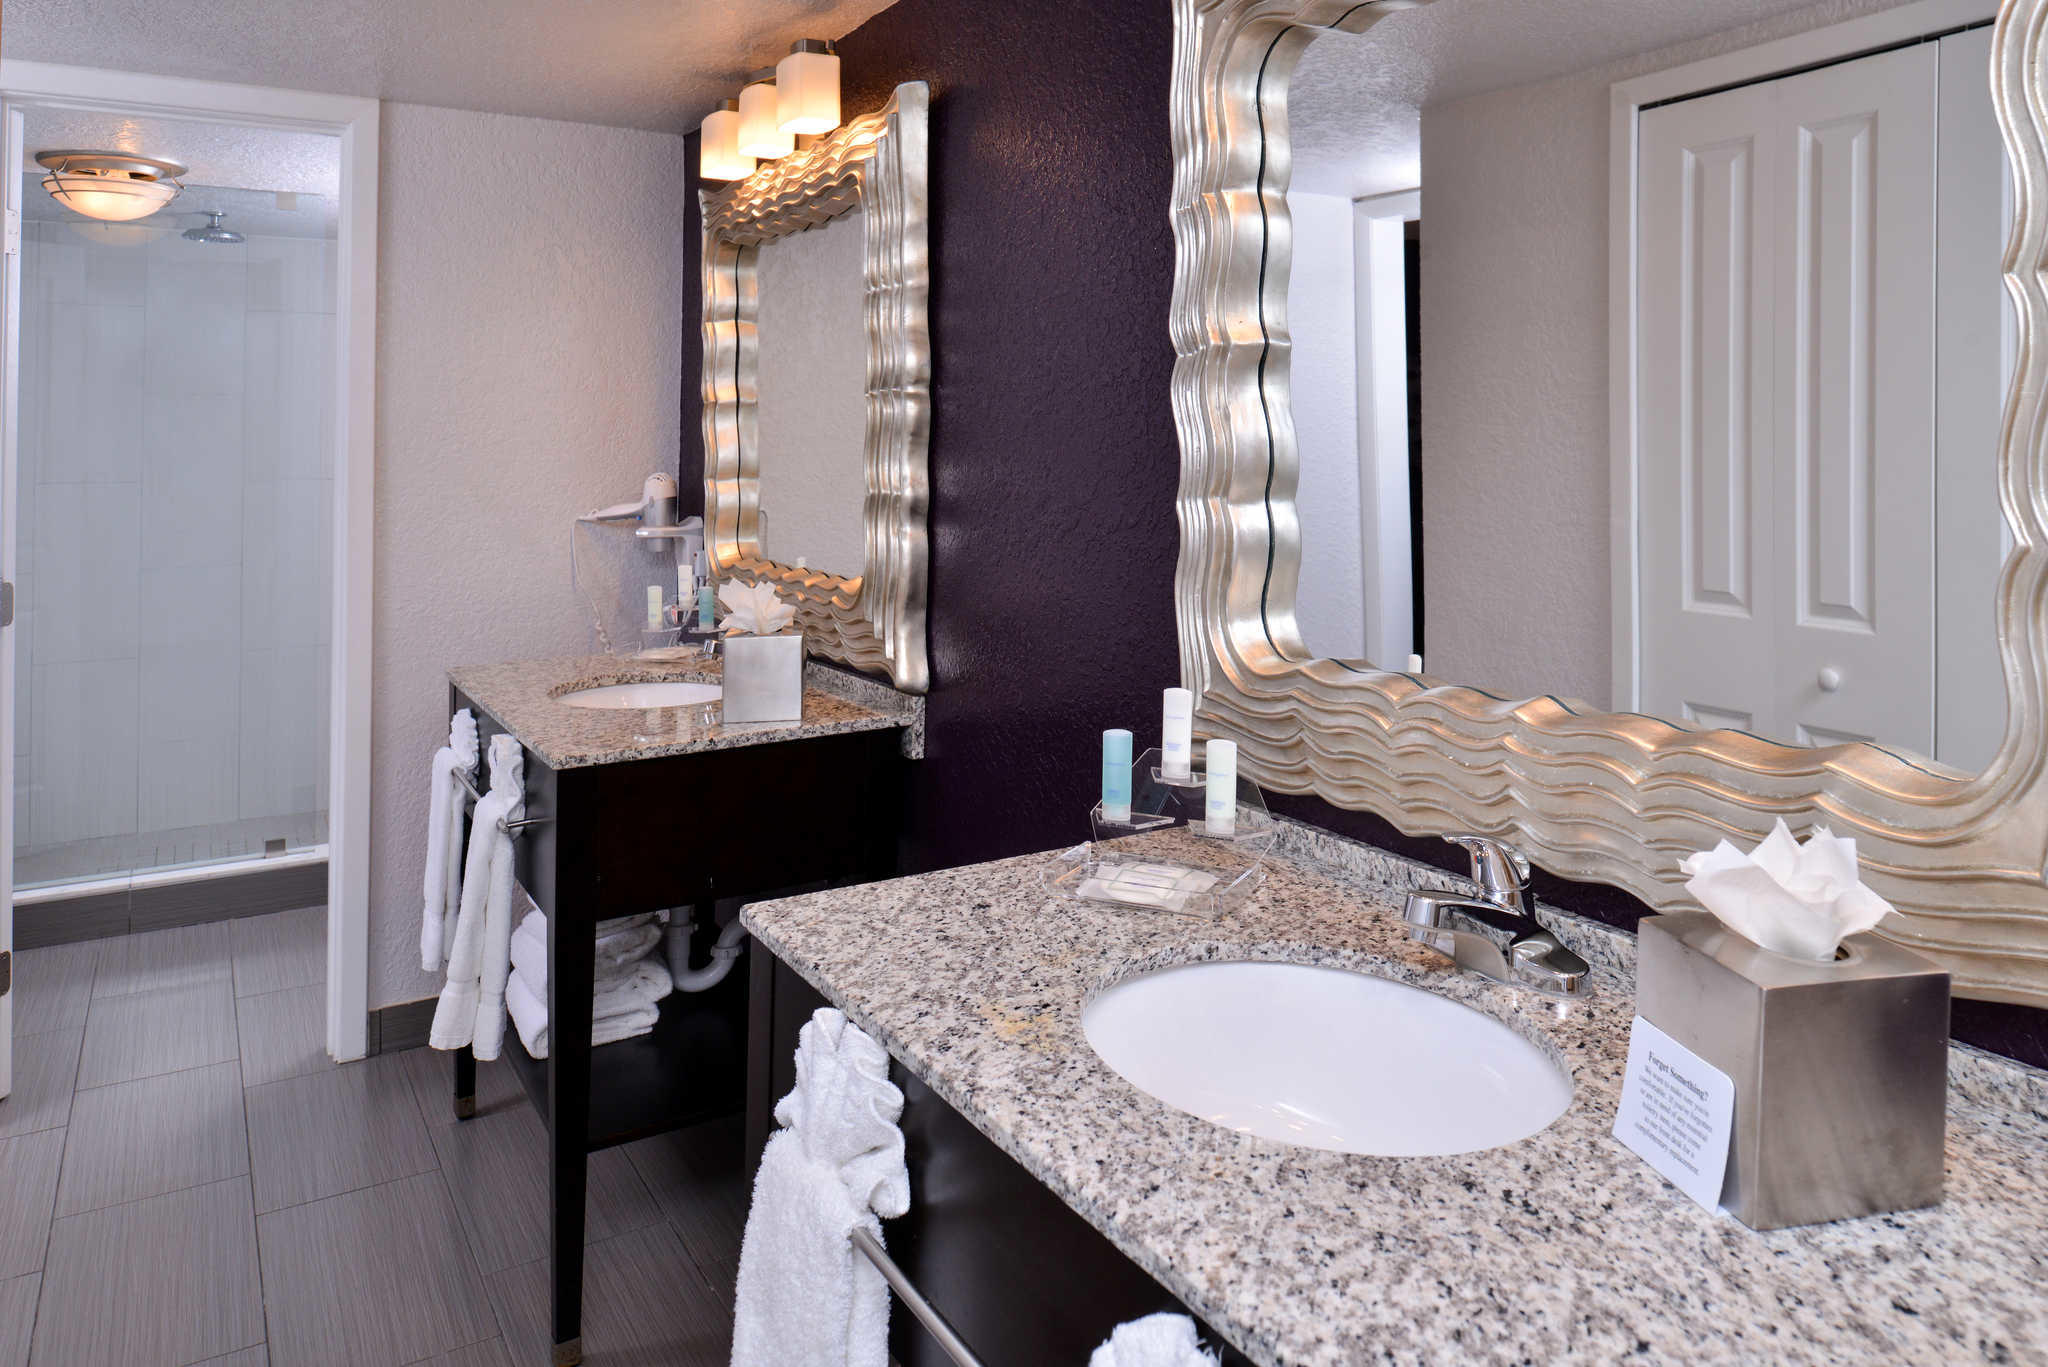 Clarion Inn & Suites Orlando near Theme Parks image 16